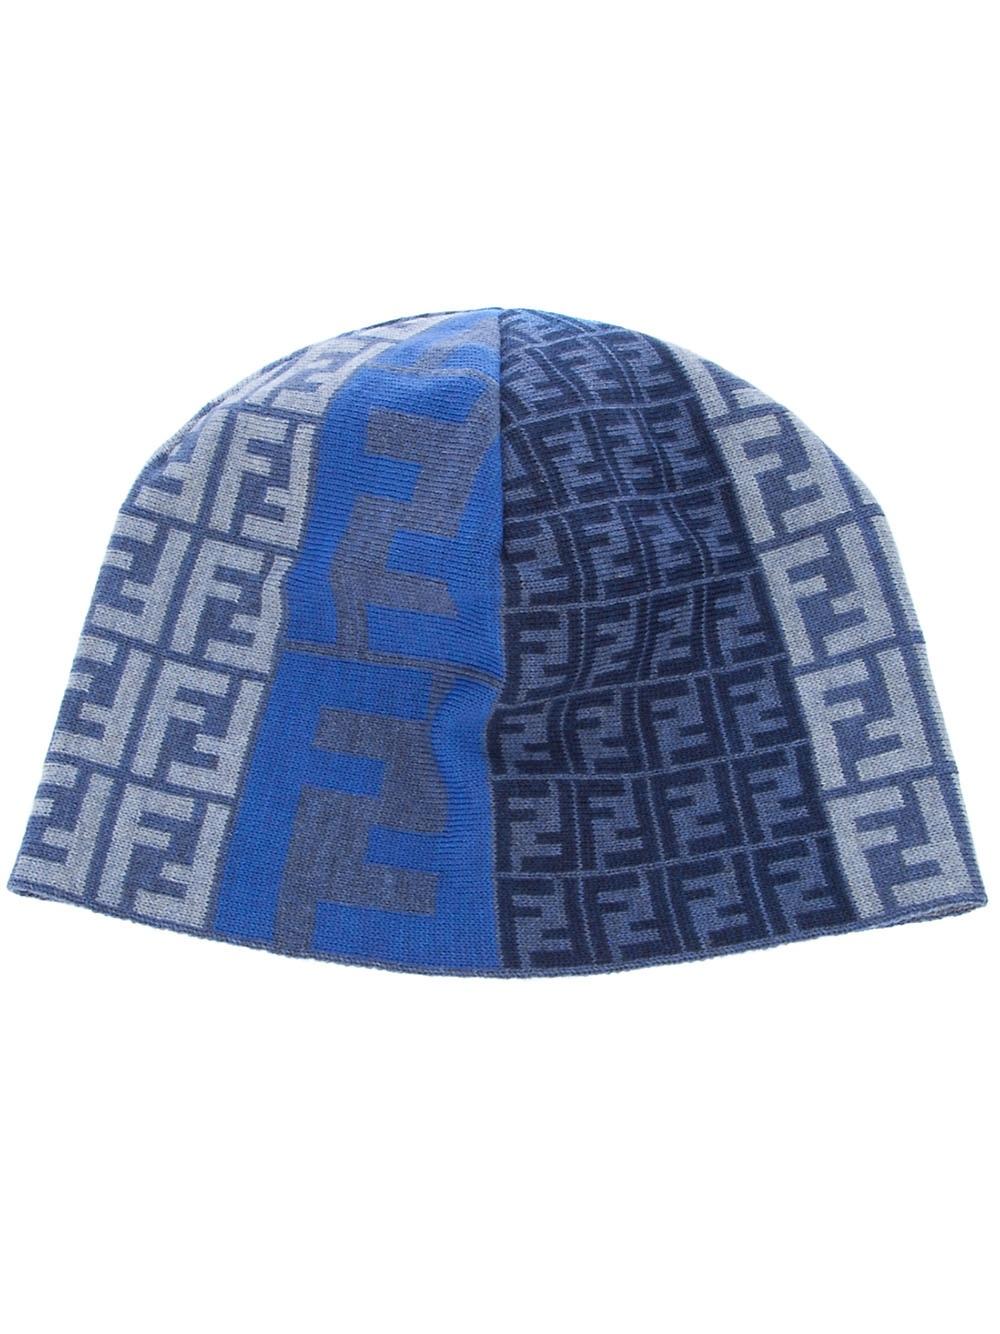 5c96026ace8 Fendi Monogram Beanie Hat in Blue for Men - Lyst